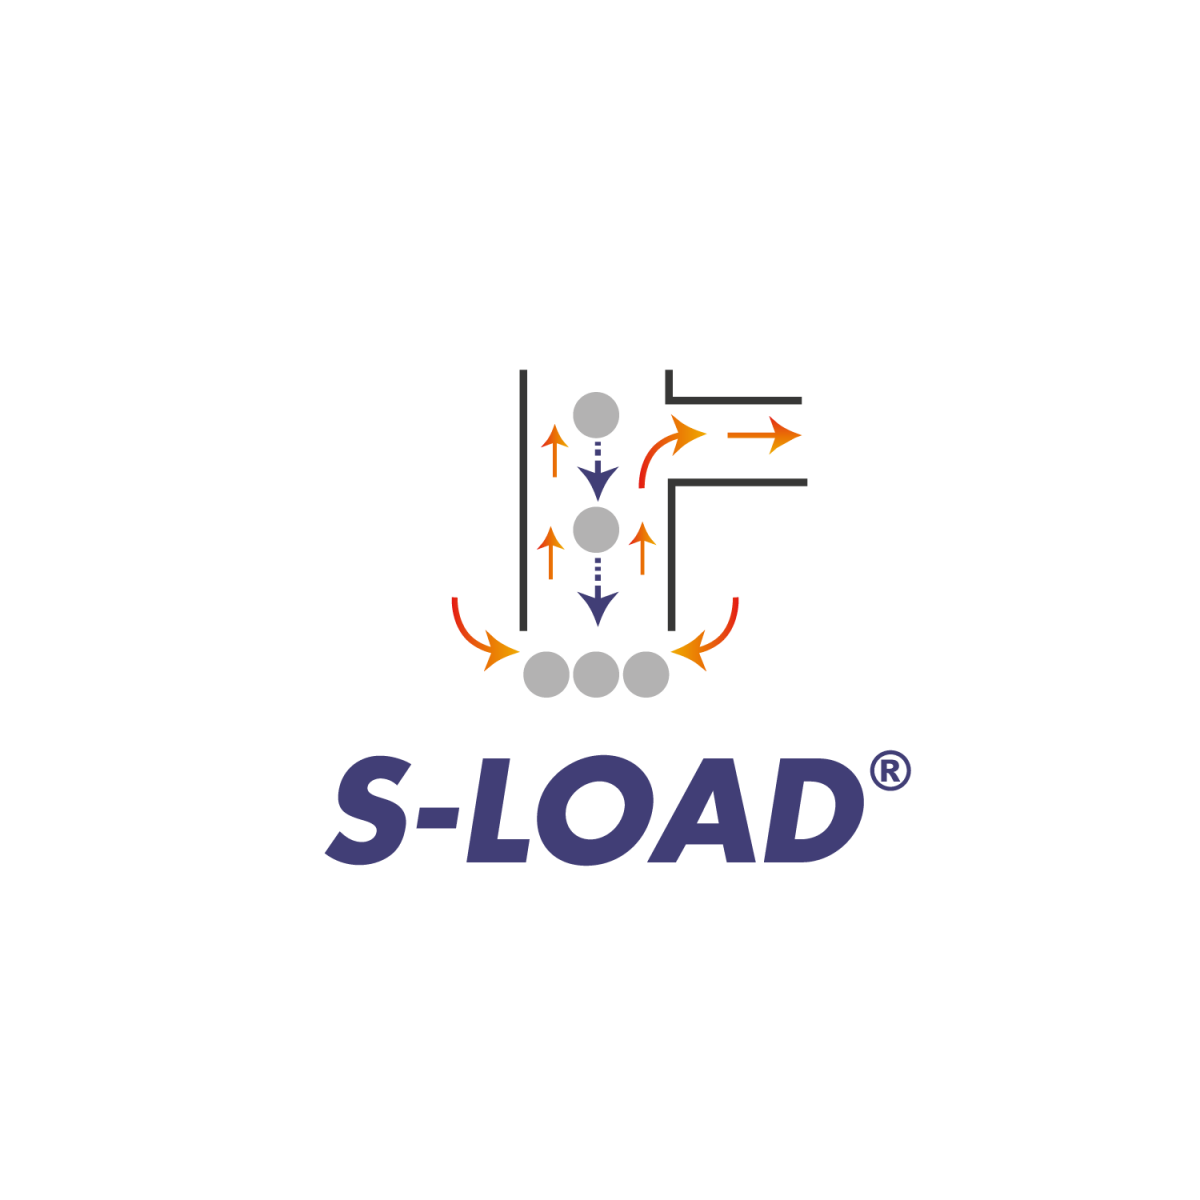 LOGO - S_LOAD